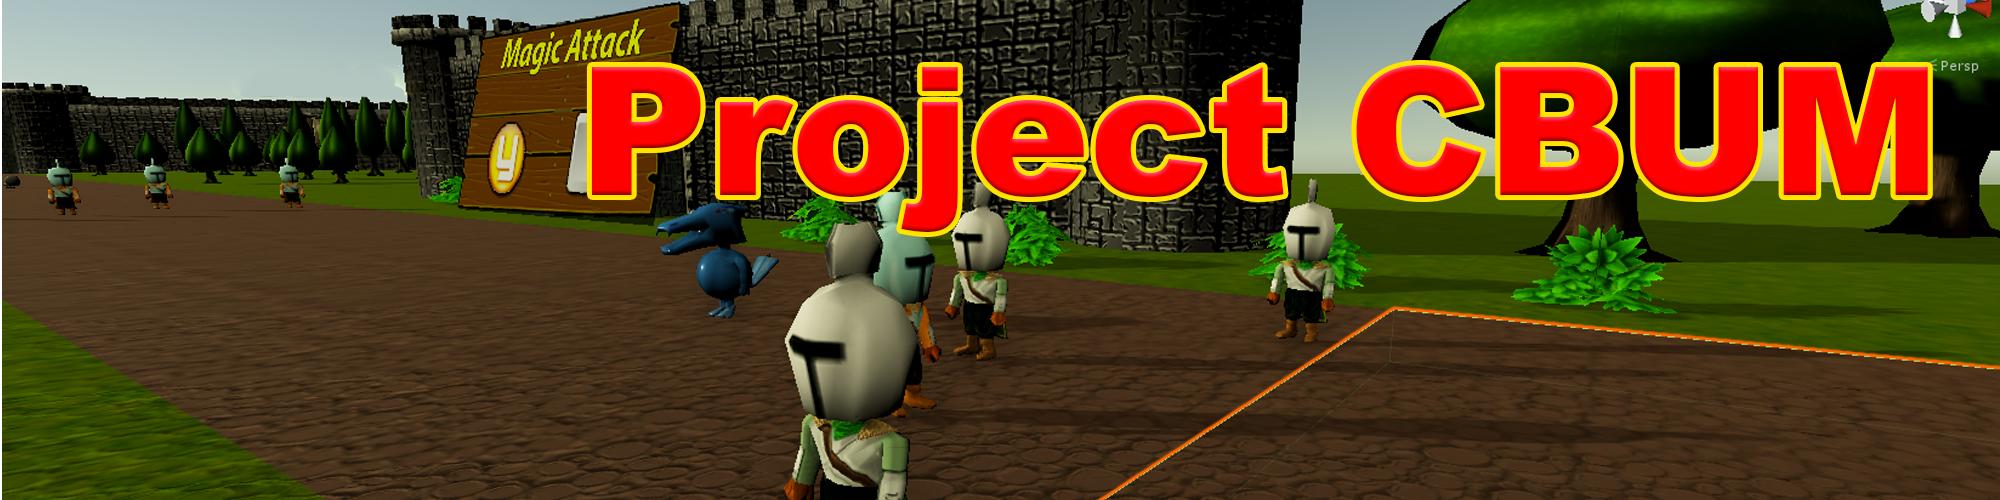 project CBUM